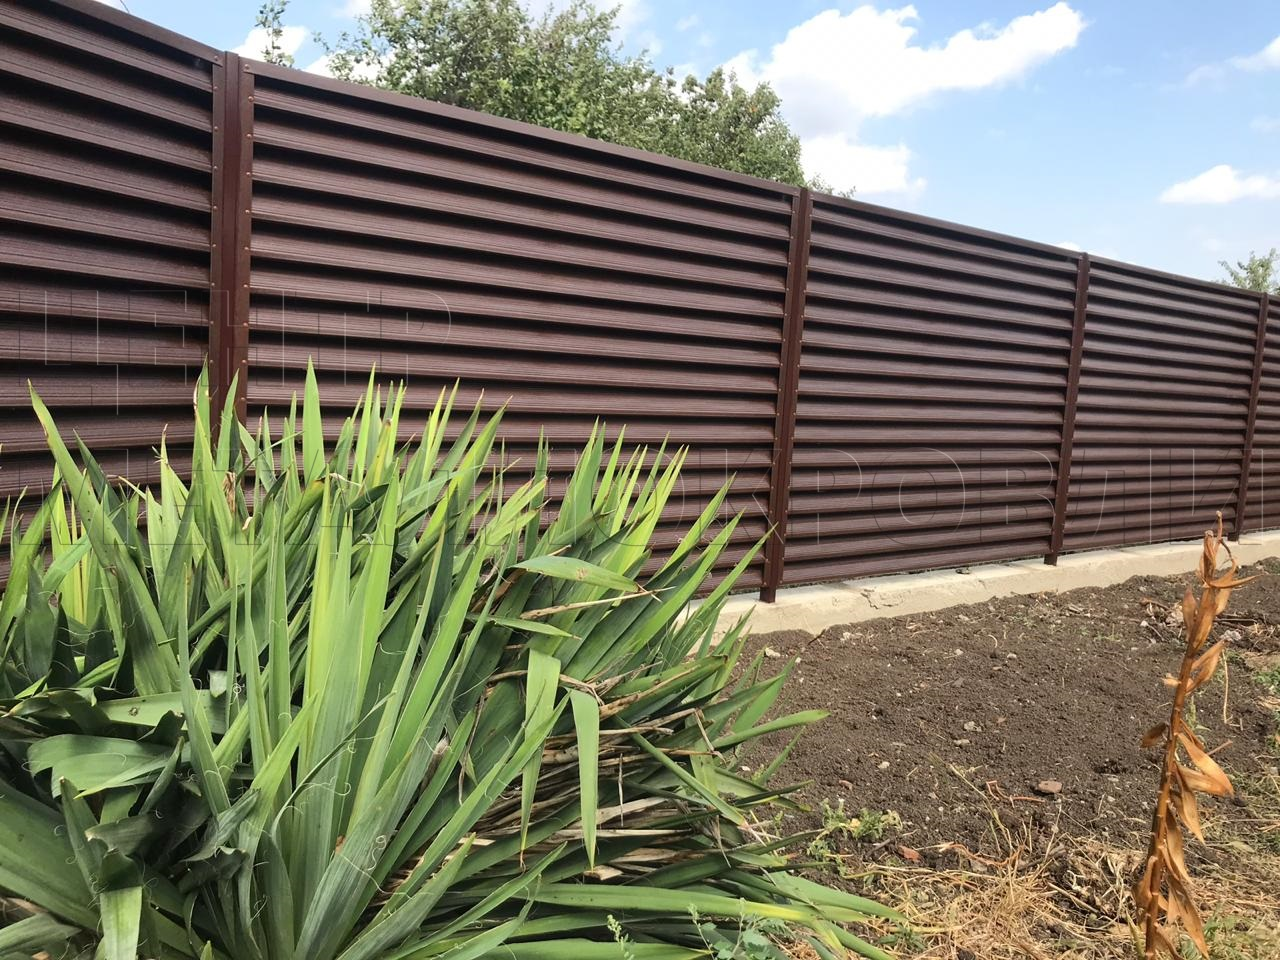 Забор с ламелями Еврожалюзи в Краснодаре